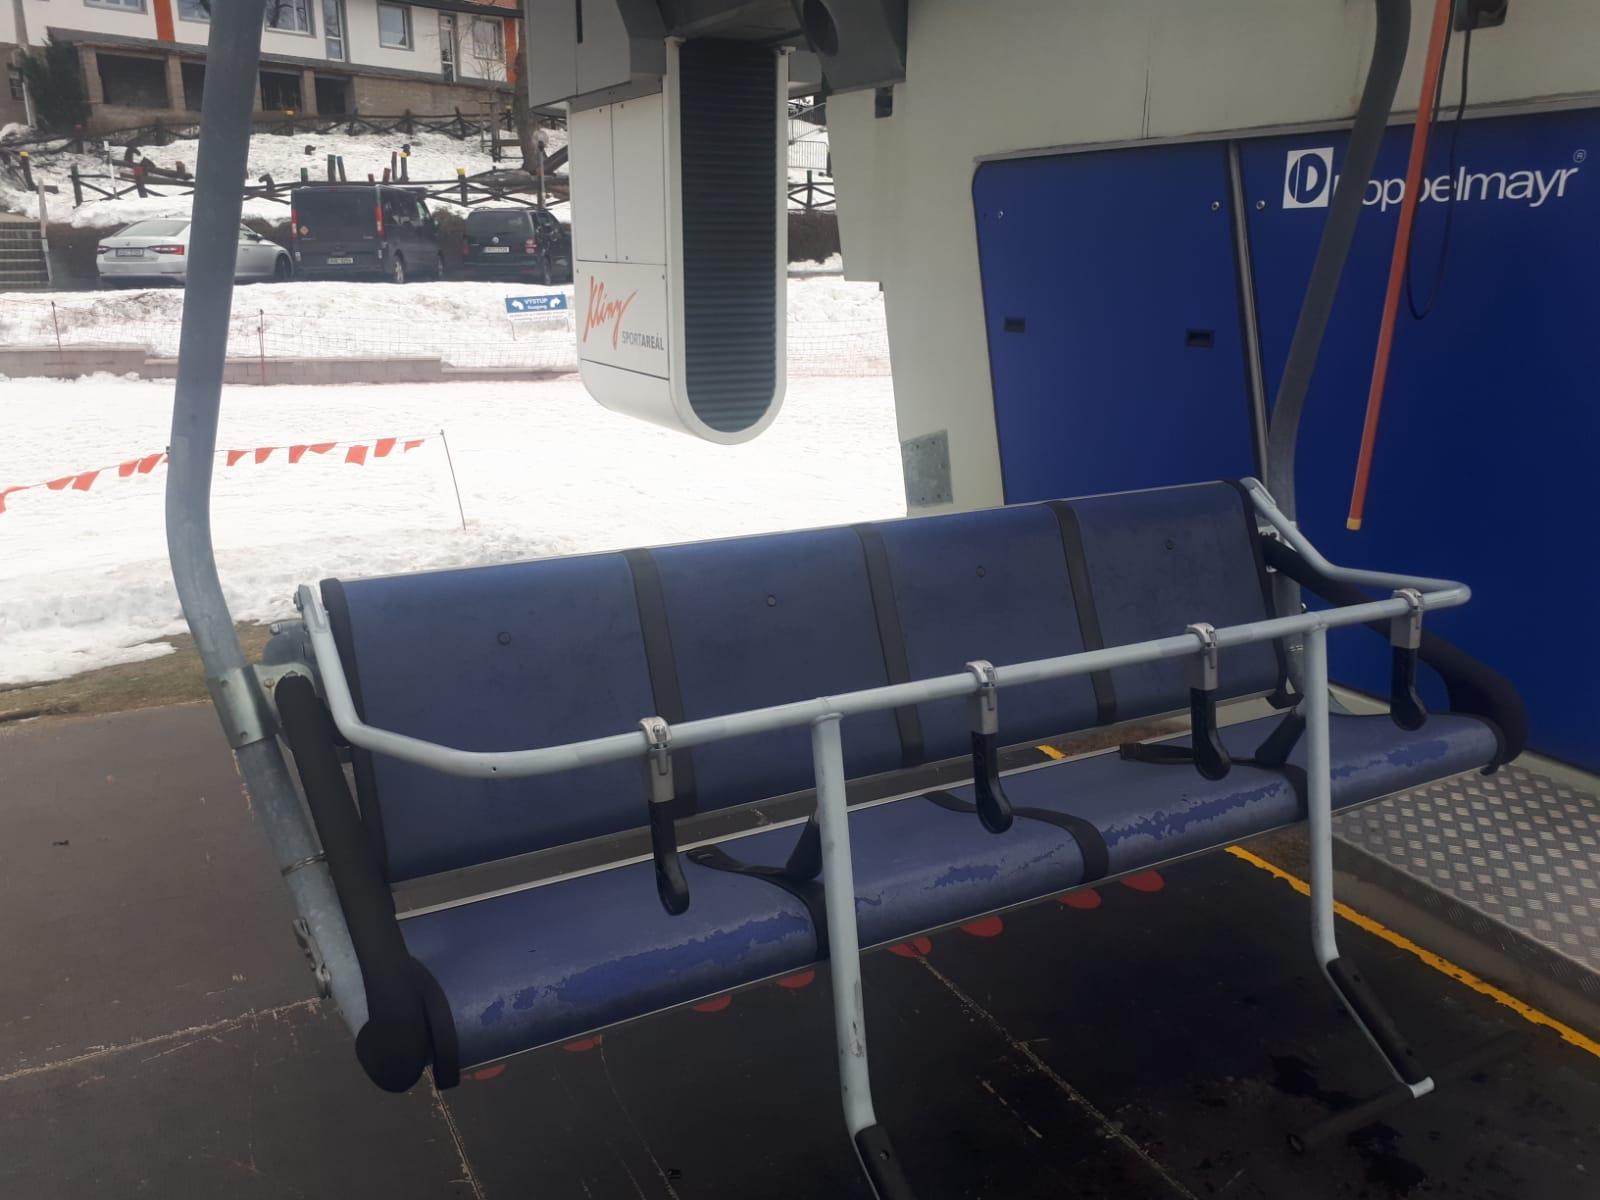 chranic-proti-prepadnutiu-sedackova-lanovka-oltrade